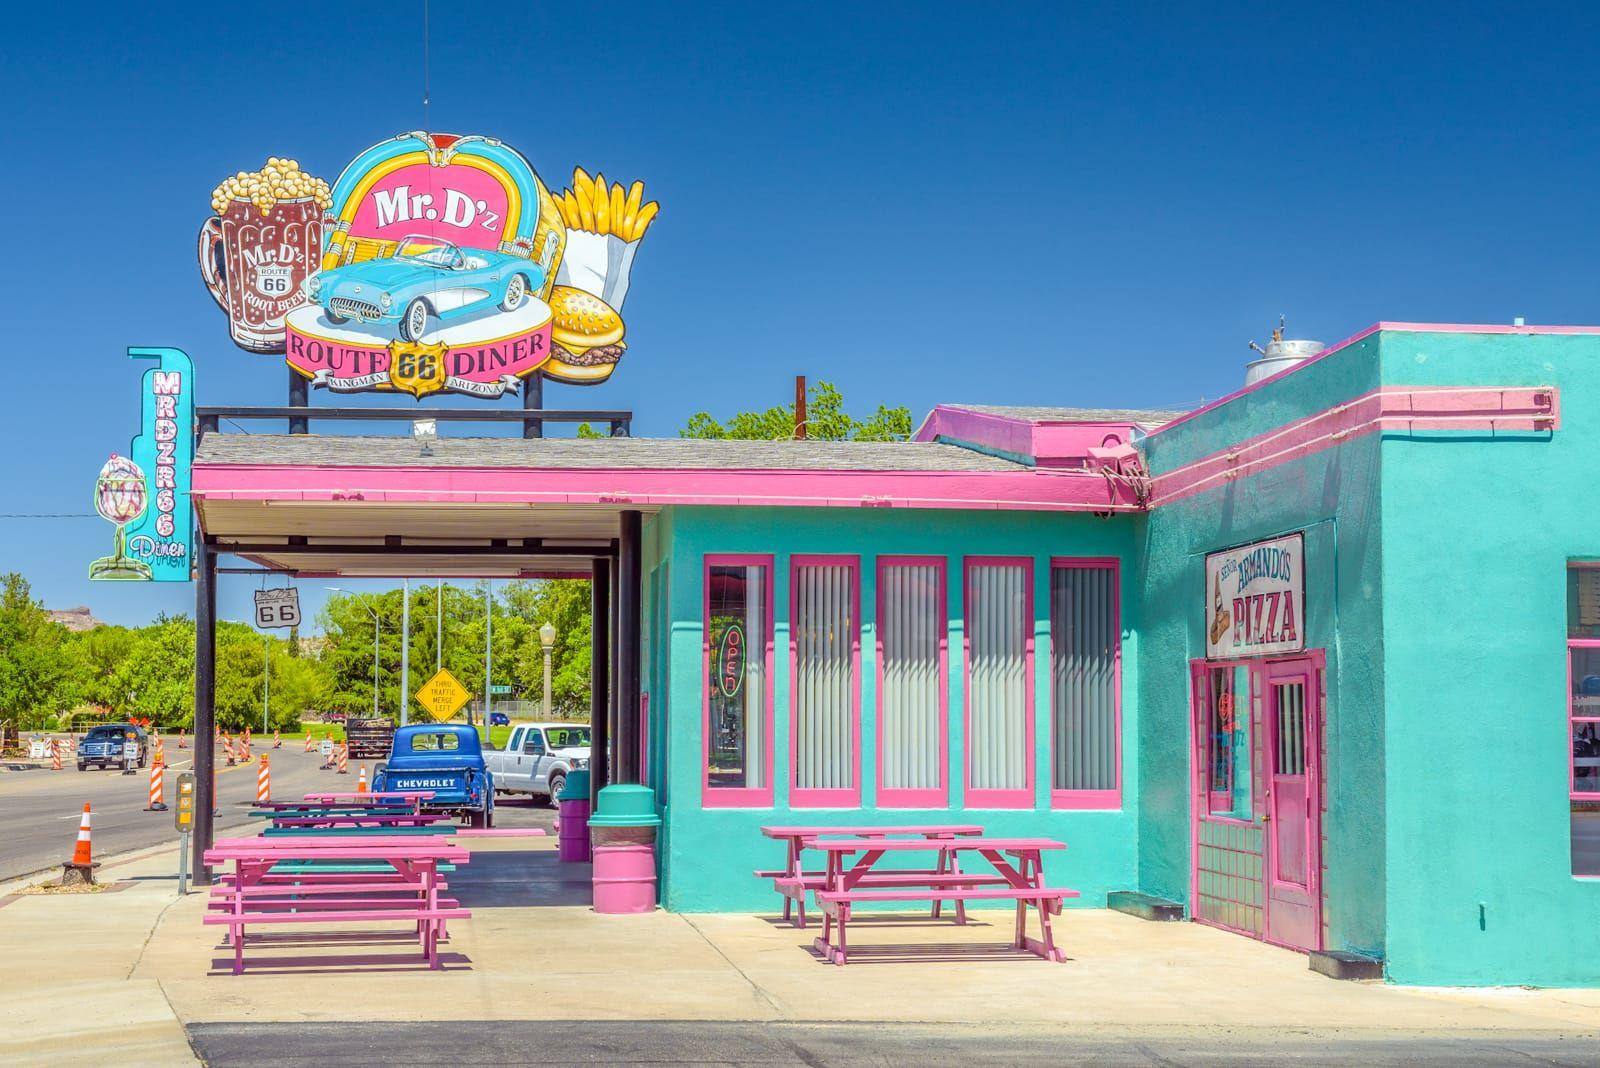 14 cool things to do in arizona arizona travel arizona